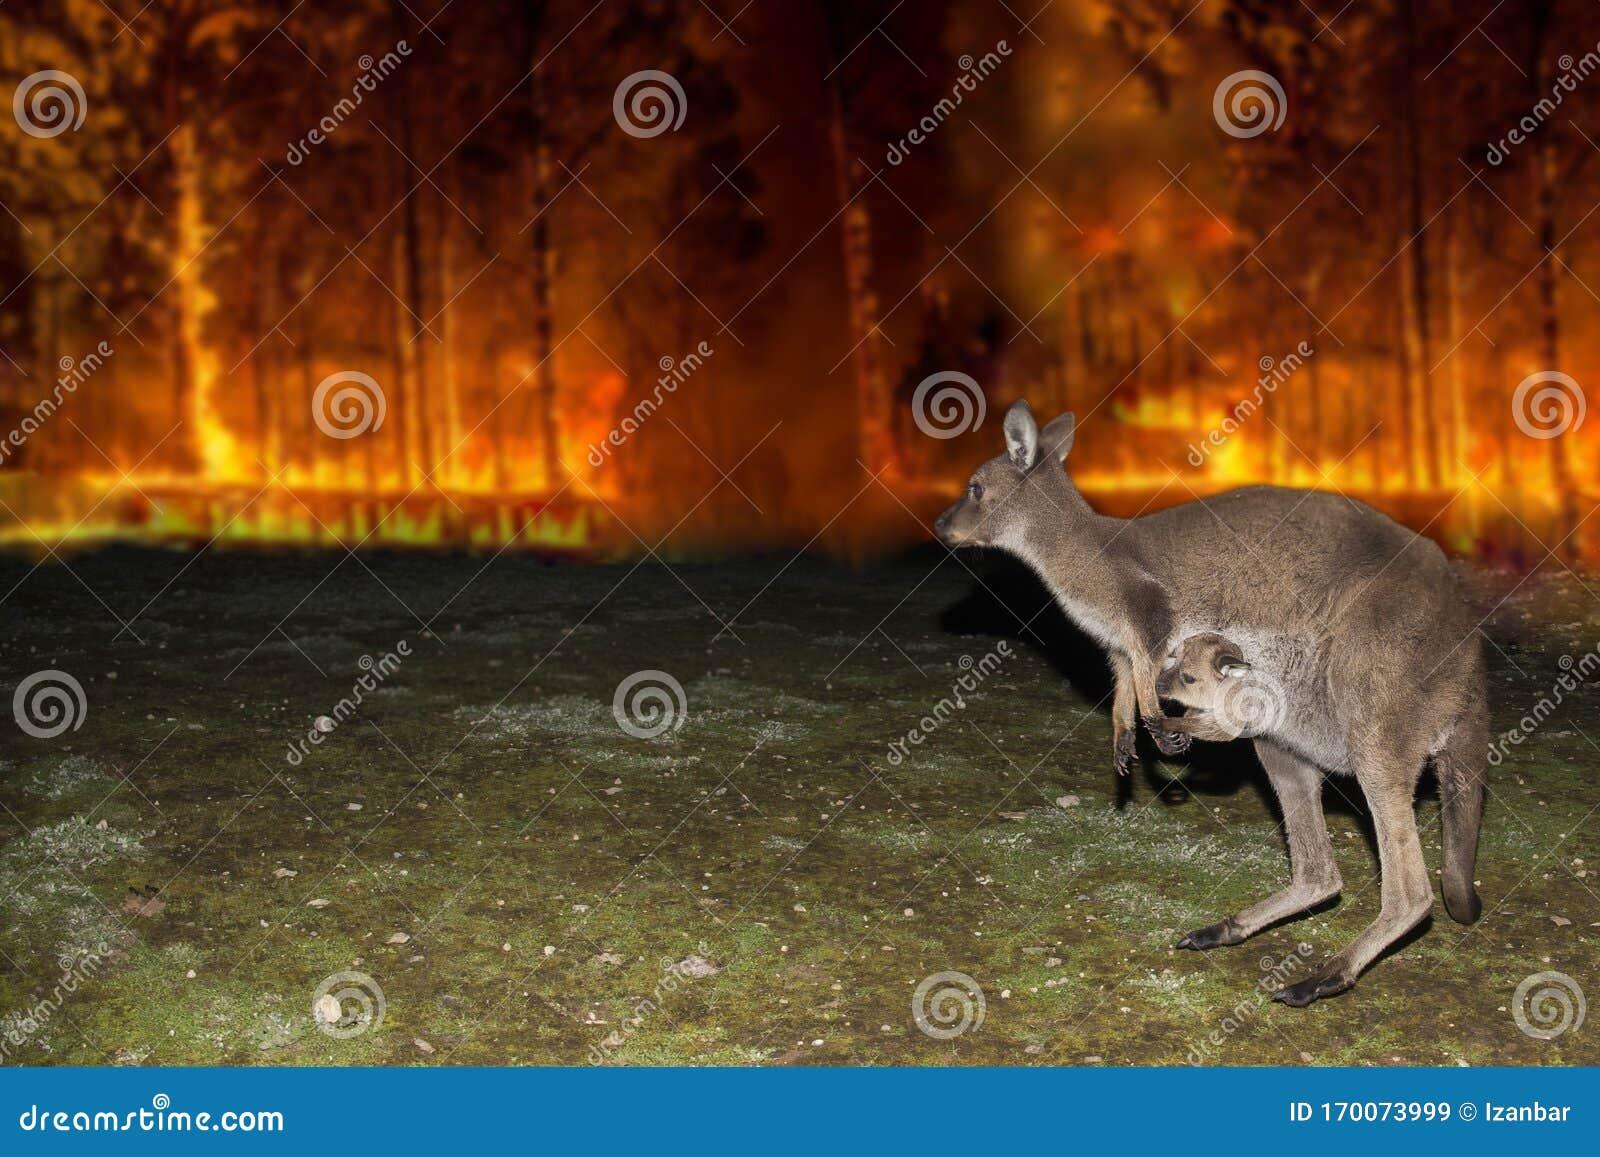 Koala In Burnt Undergrowth Royalty-Free Stock Image ...